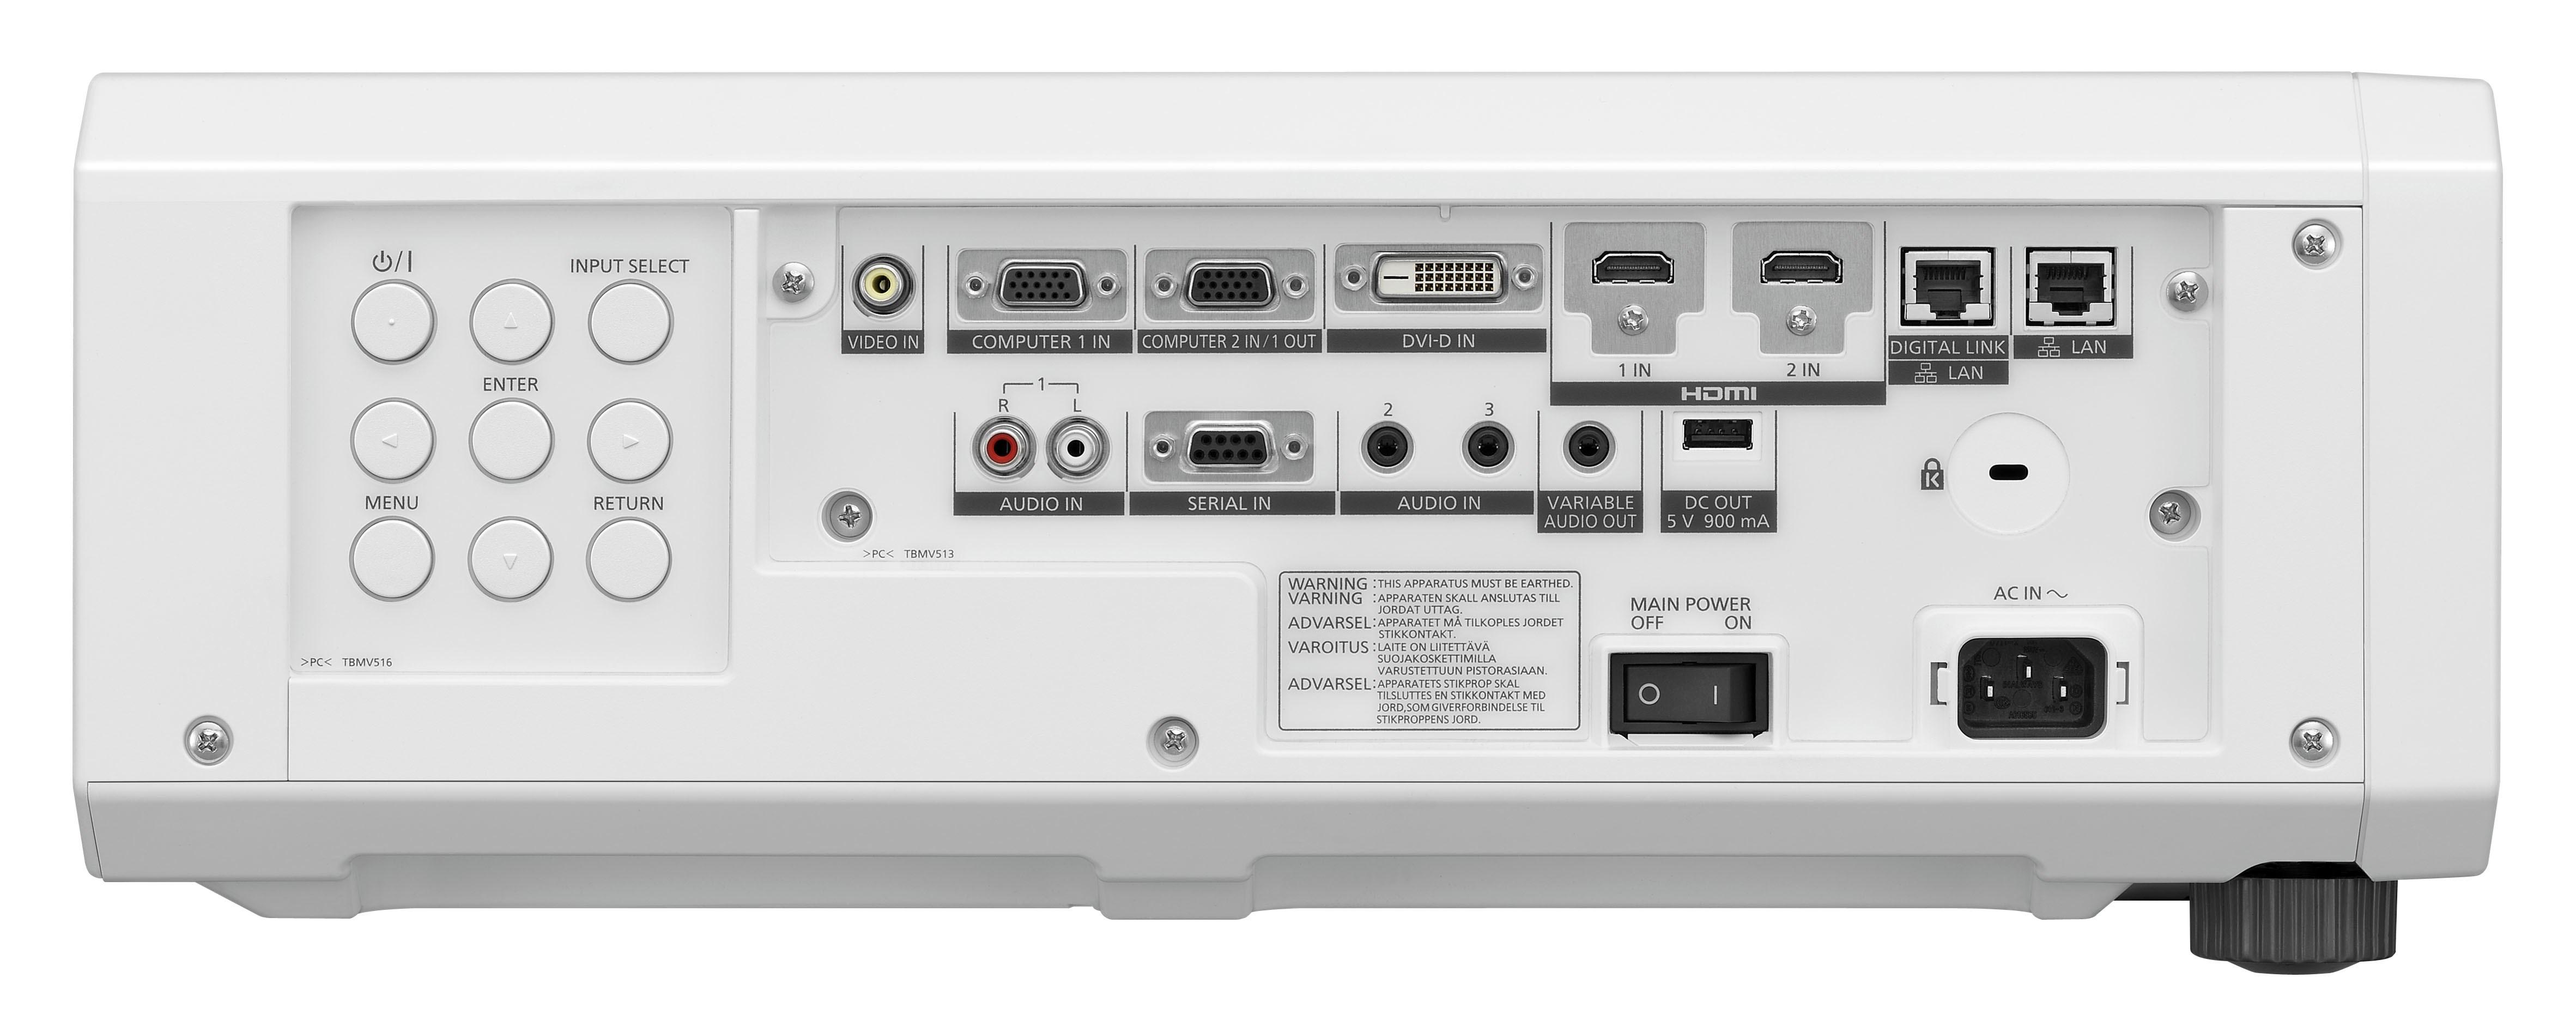 Panasonic PT-RZ570/PT-RZ575 – نمای پشت ويدئو پروجکشن Full HD با تکنولوژی لیزری و قابلیت 24/7مدل PT-RZ470